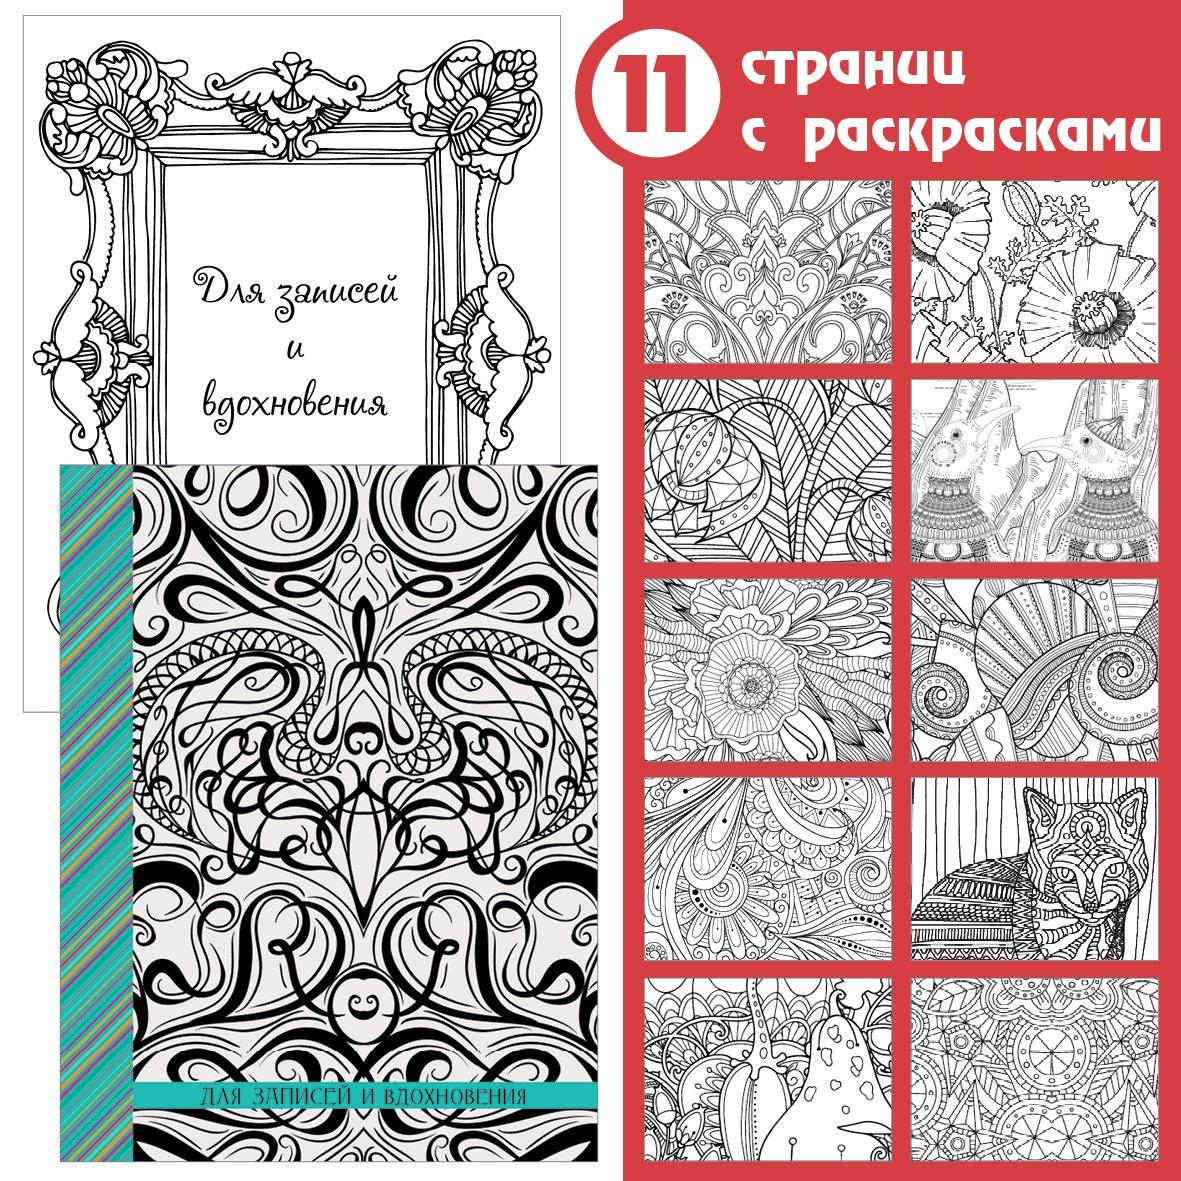 Paper Art. Изящный орнамент А6+, 96 л. (раскраски внутри)